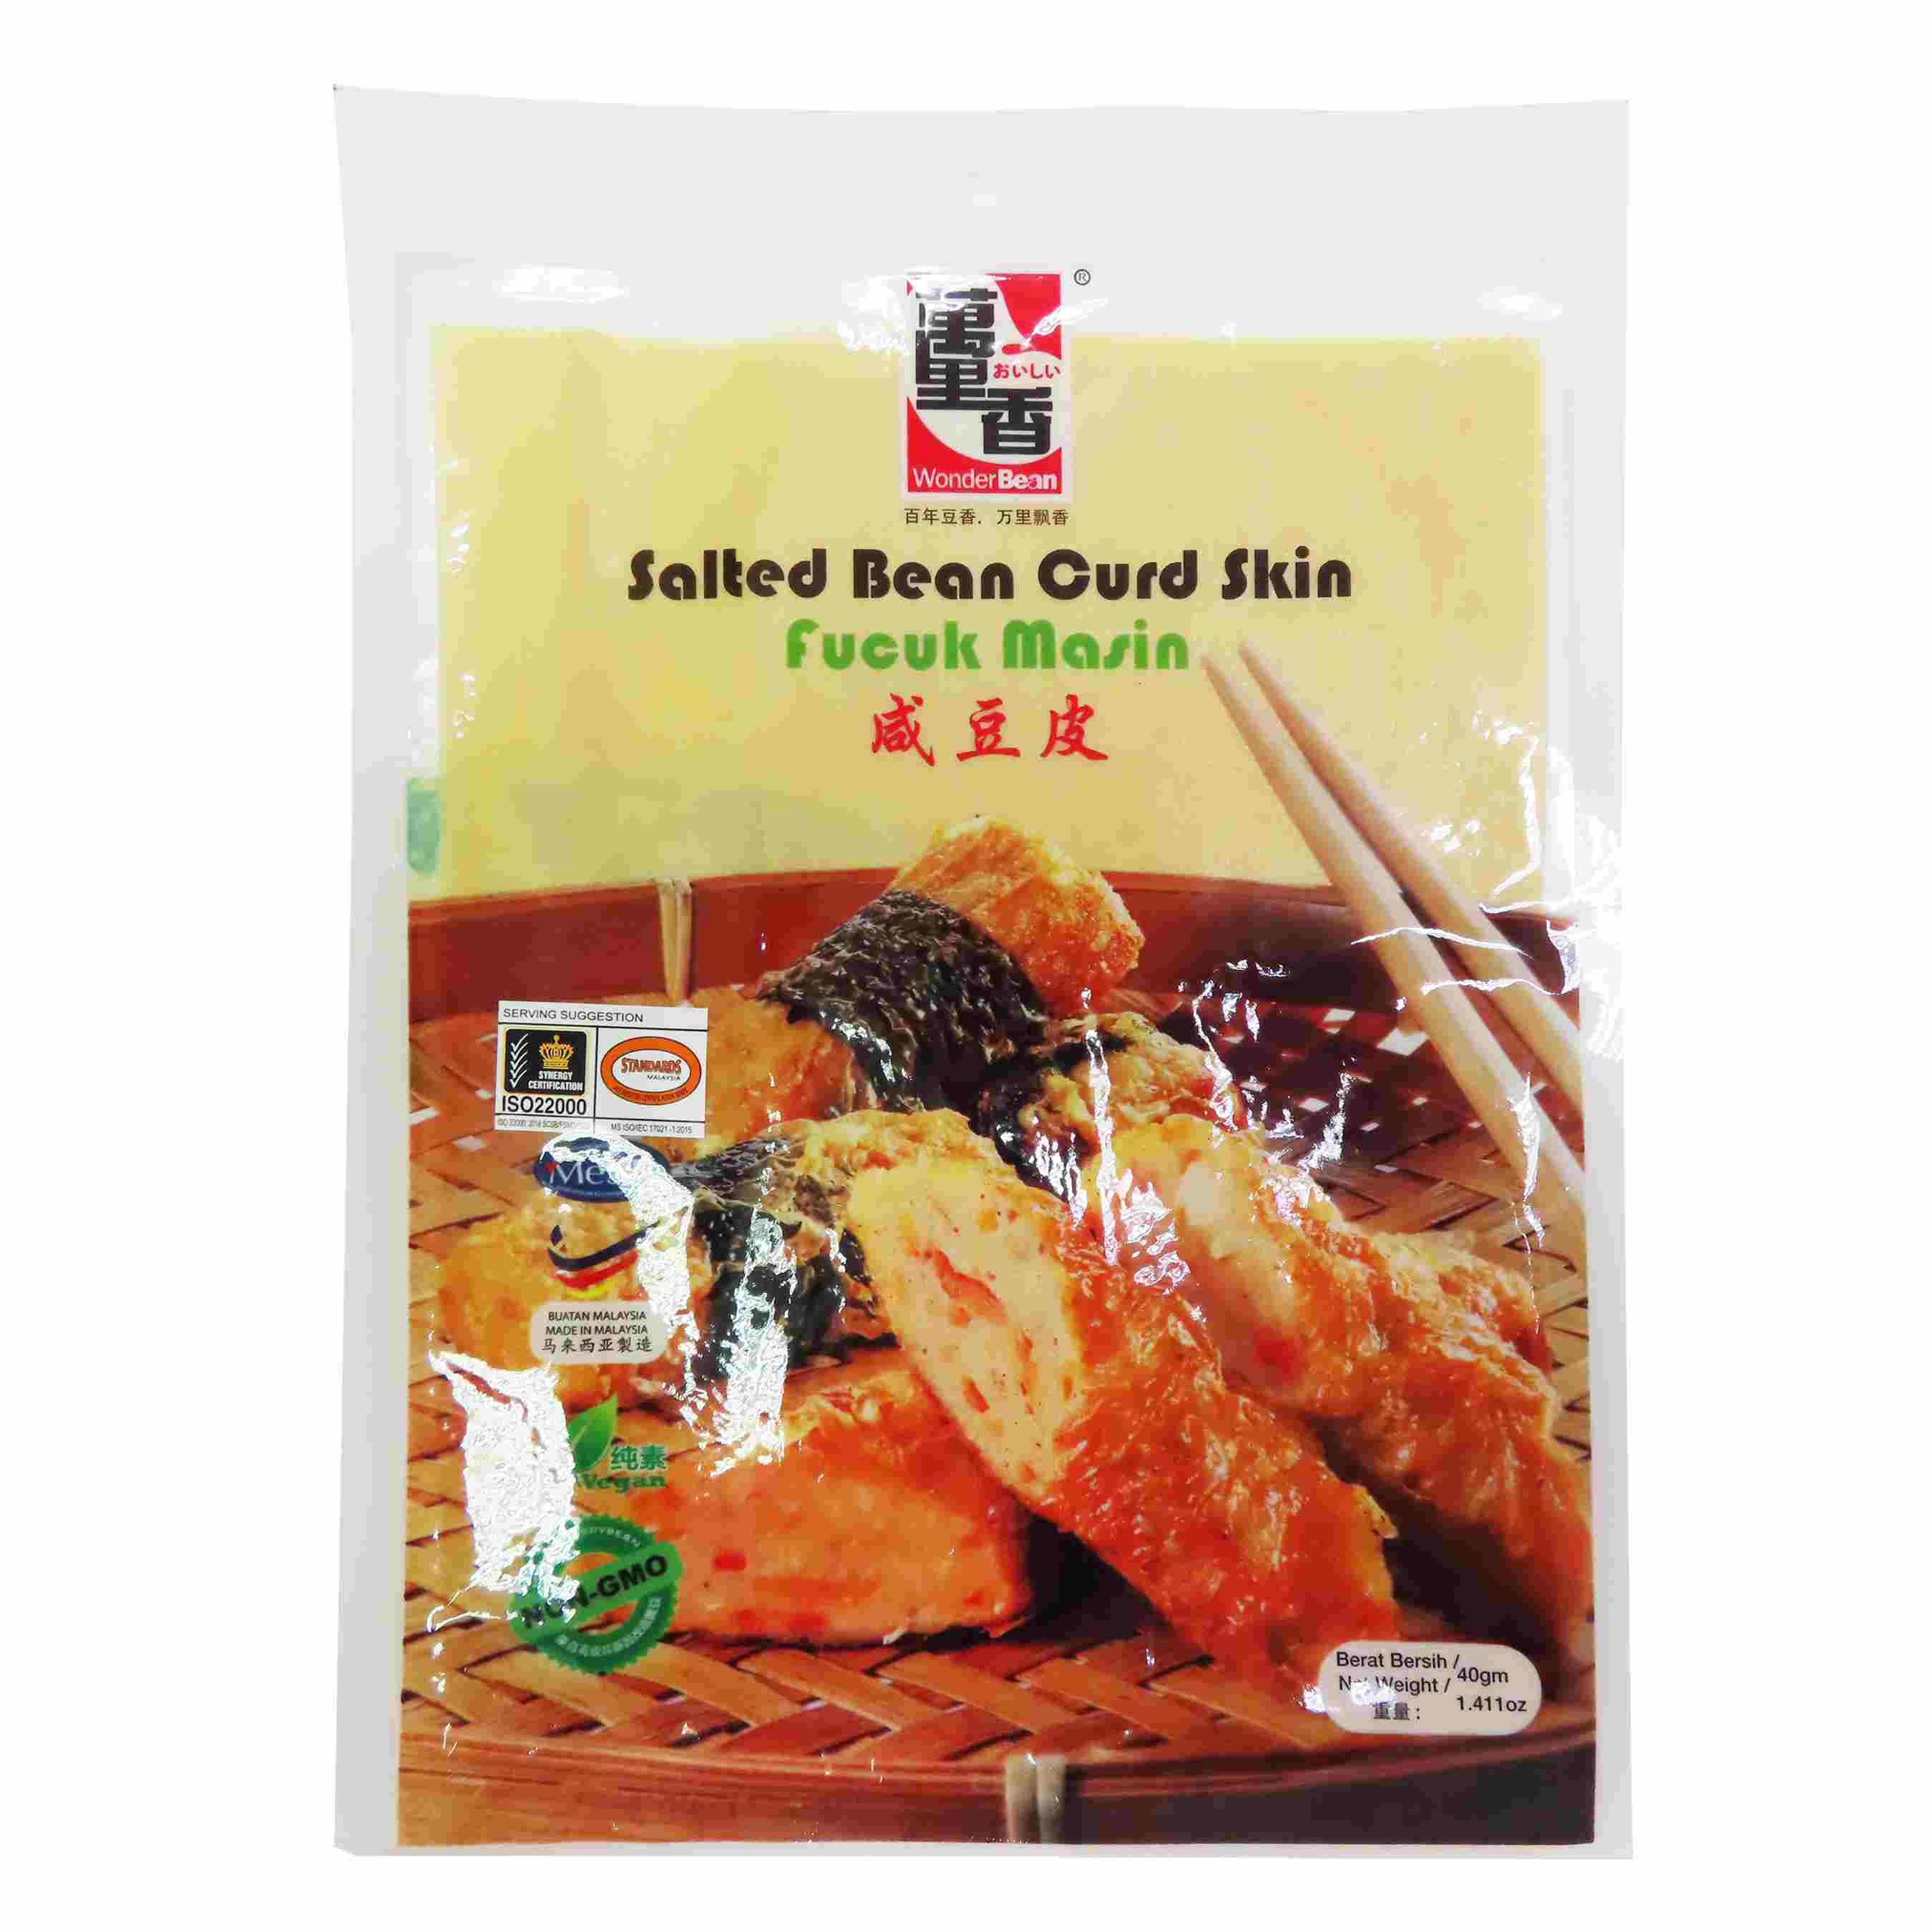 Image Salted Bean Curd Skin 万里香 - 咸豆皮 40grams